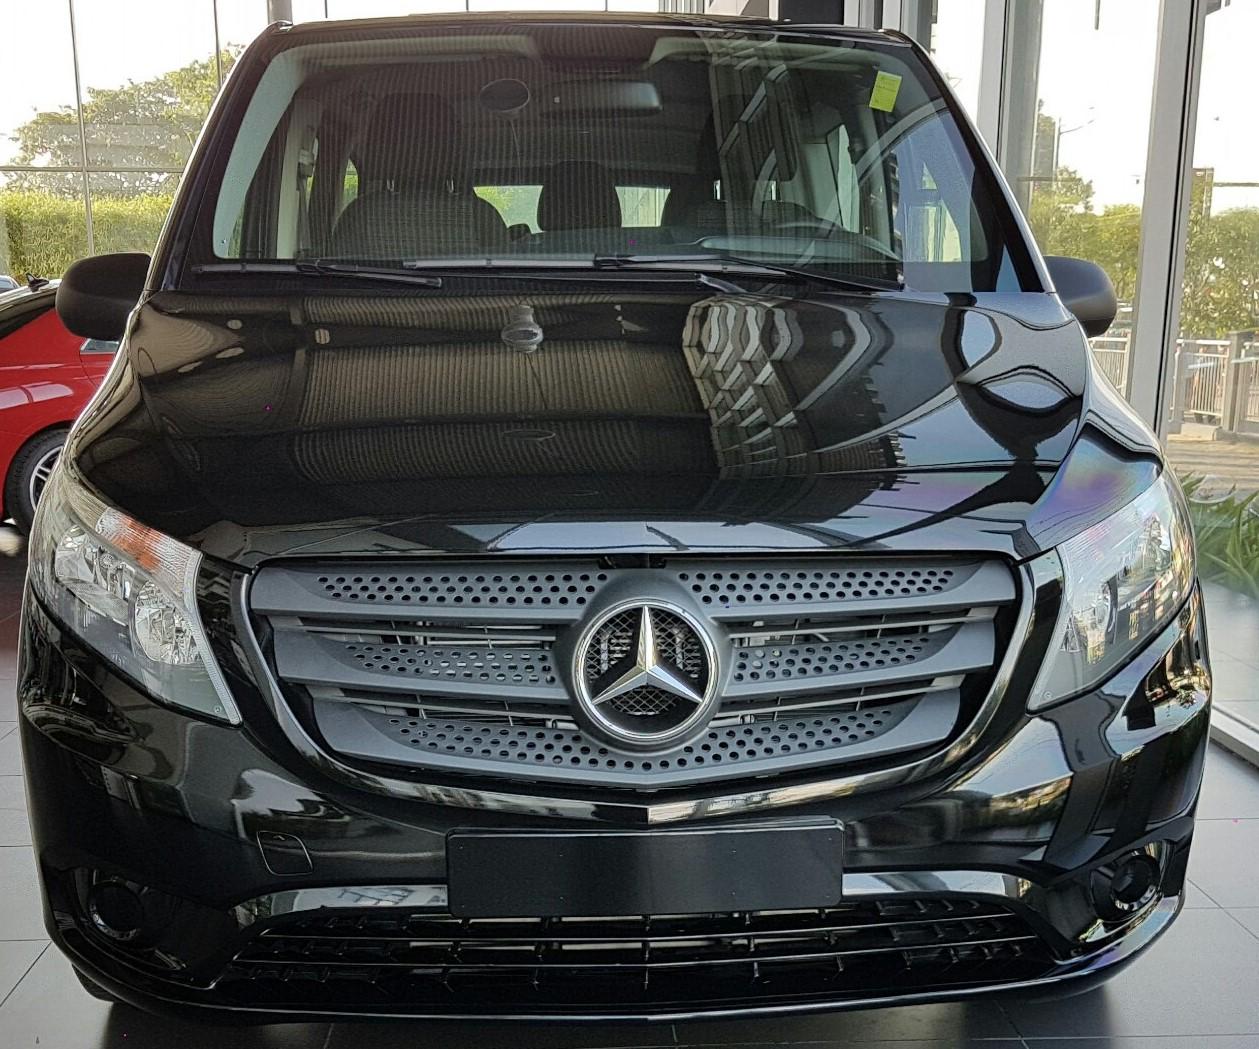 Ngoại thất Xe Mercedes Benz Vito Tourer 121 Máy Xăng màu đen 01